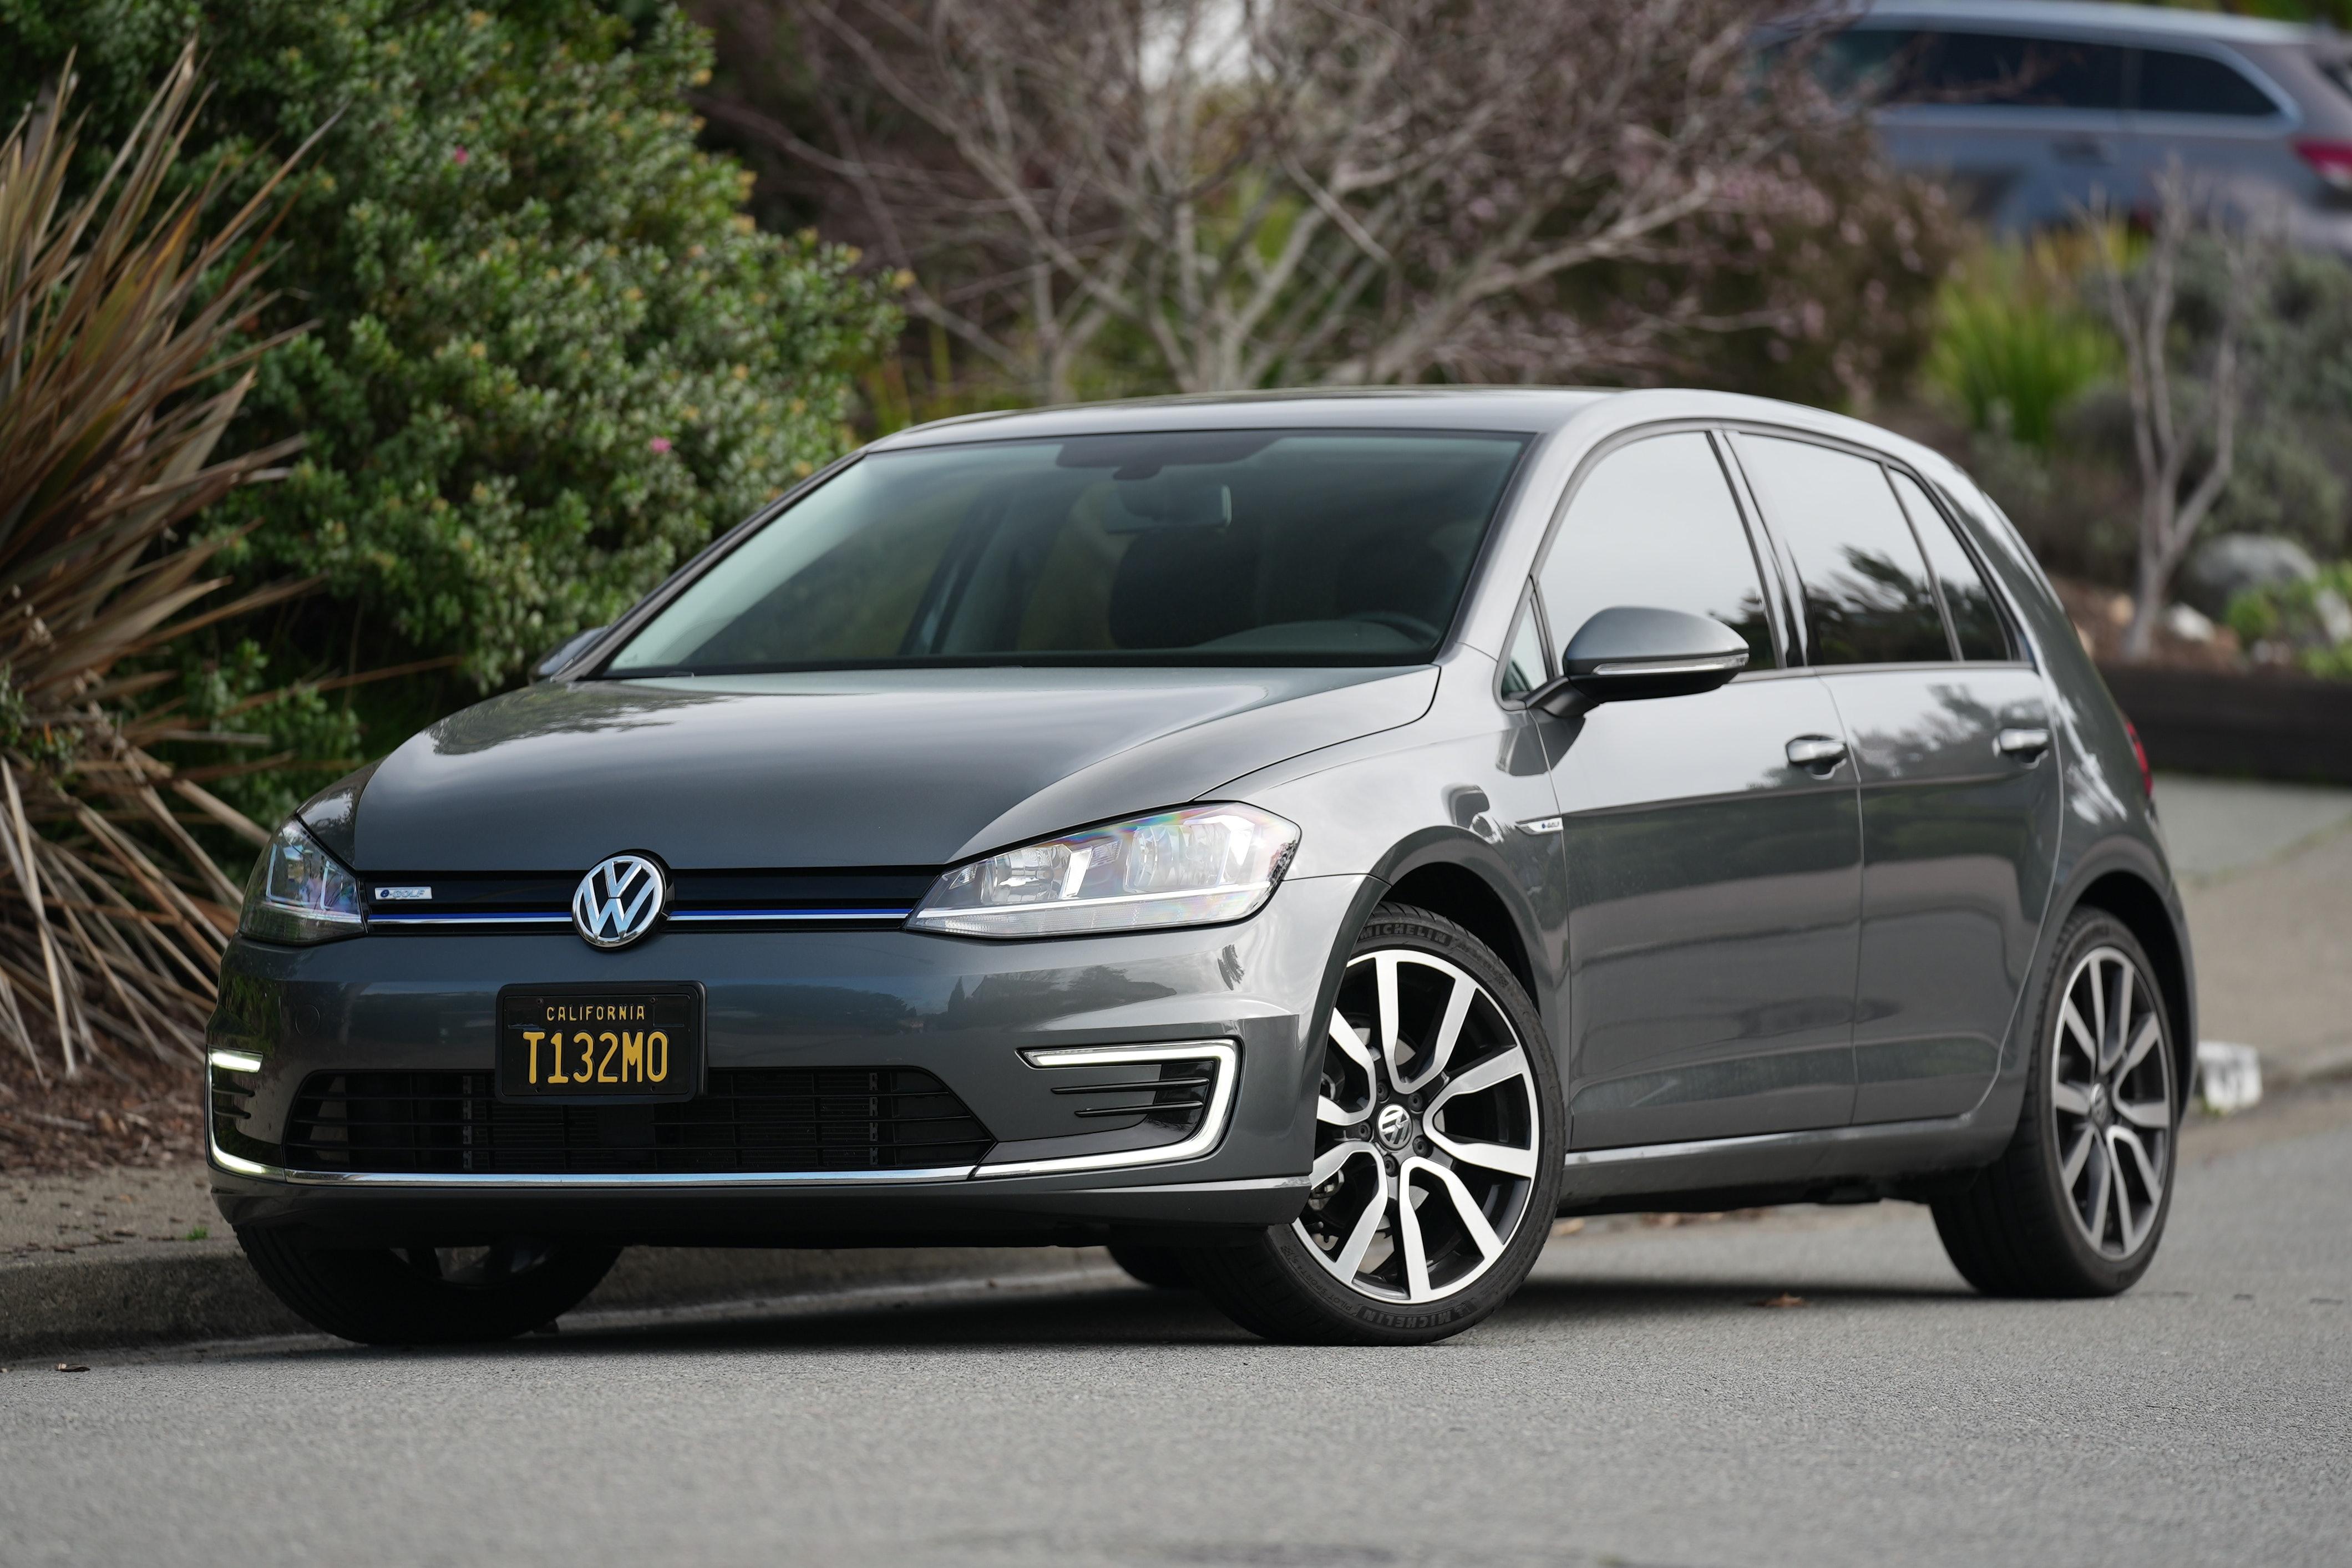 2009 Volkswagen e-Golf